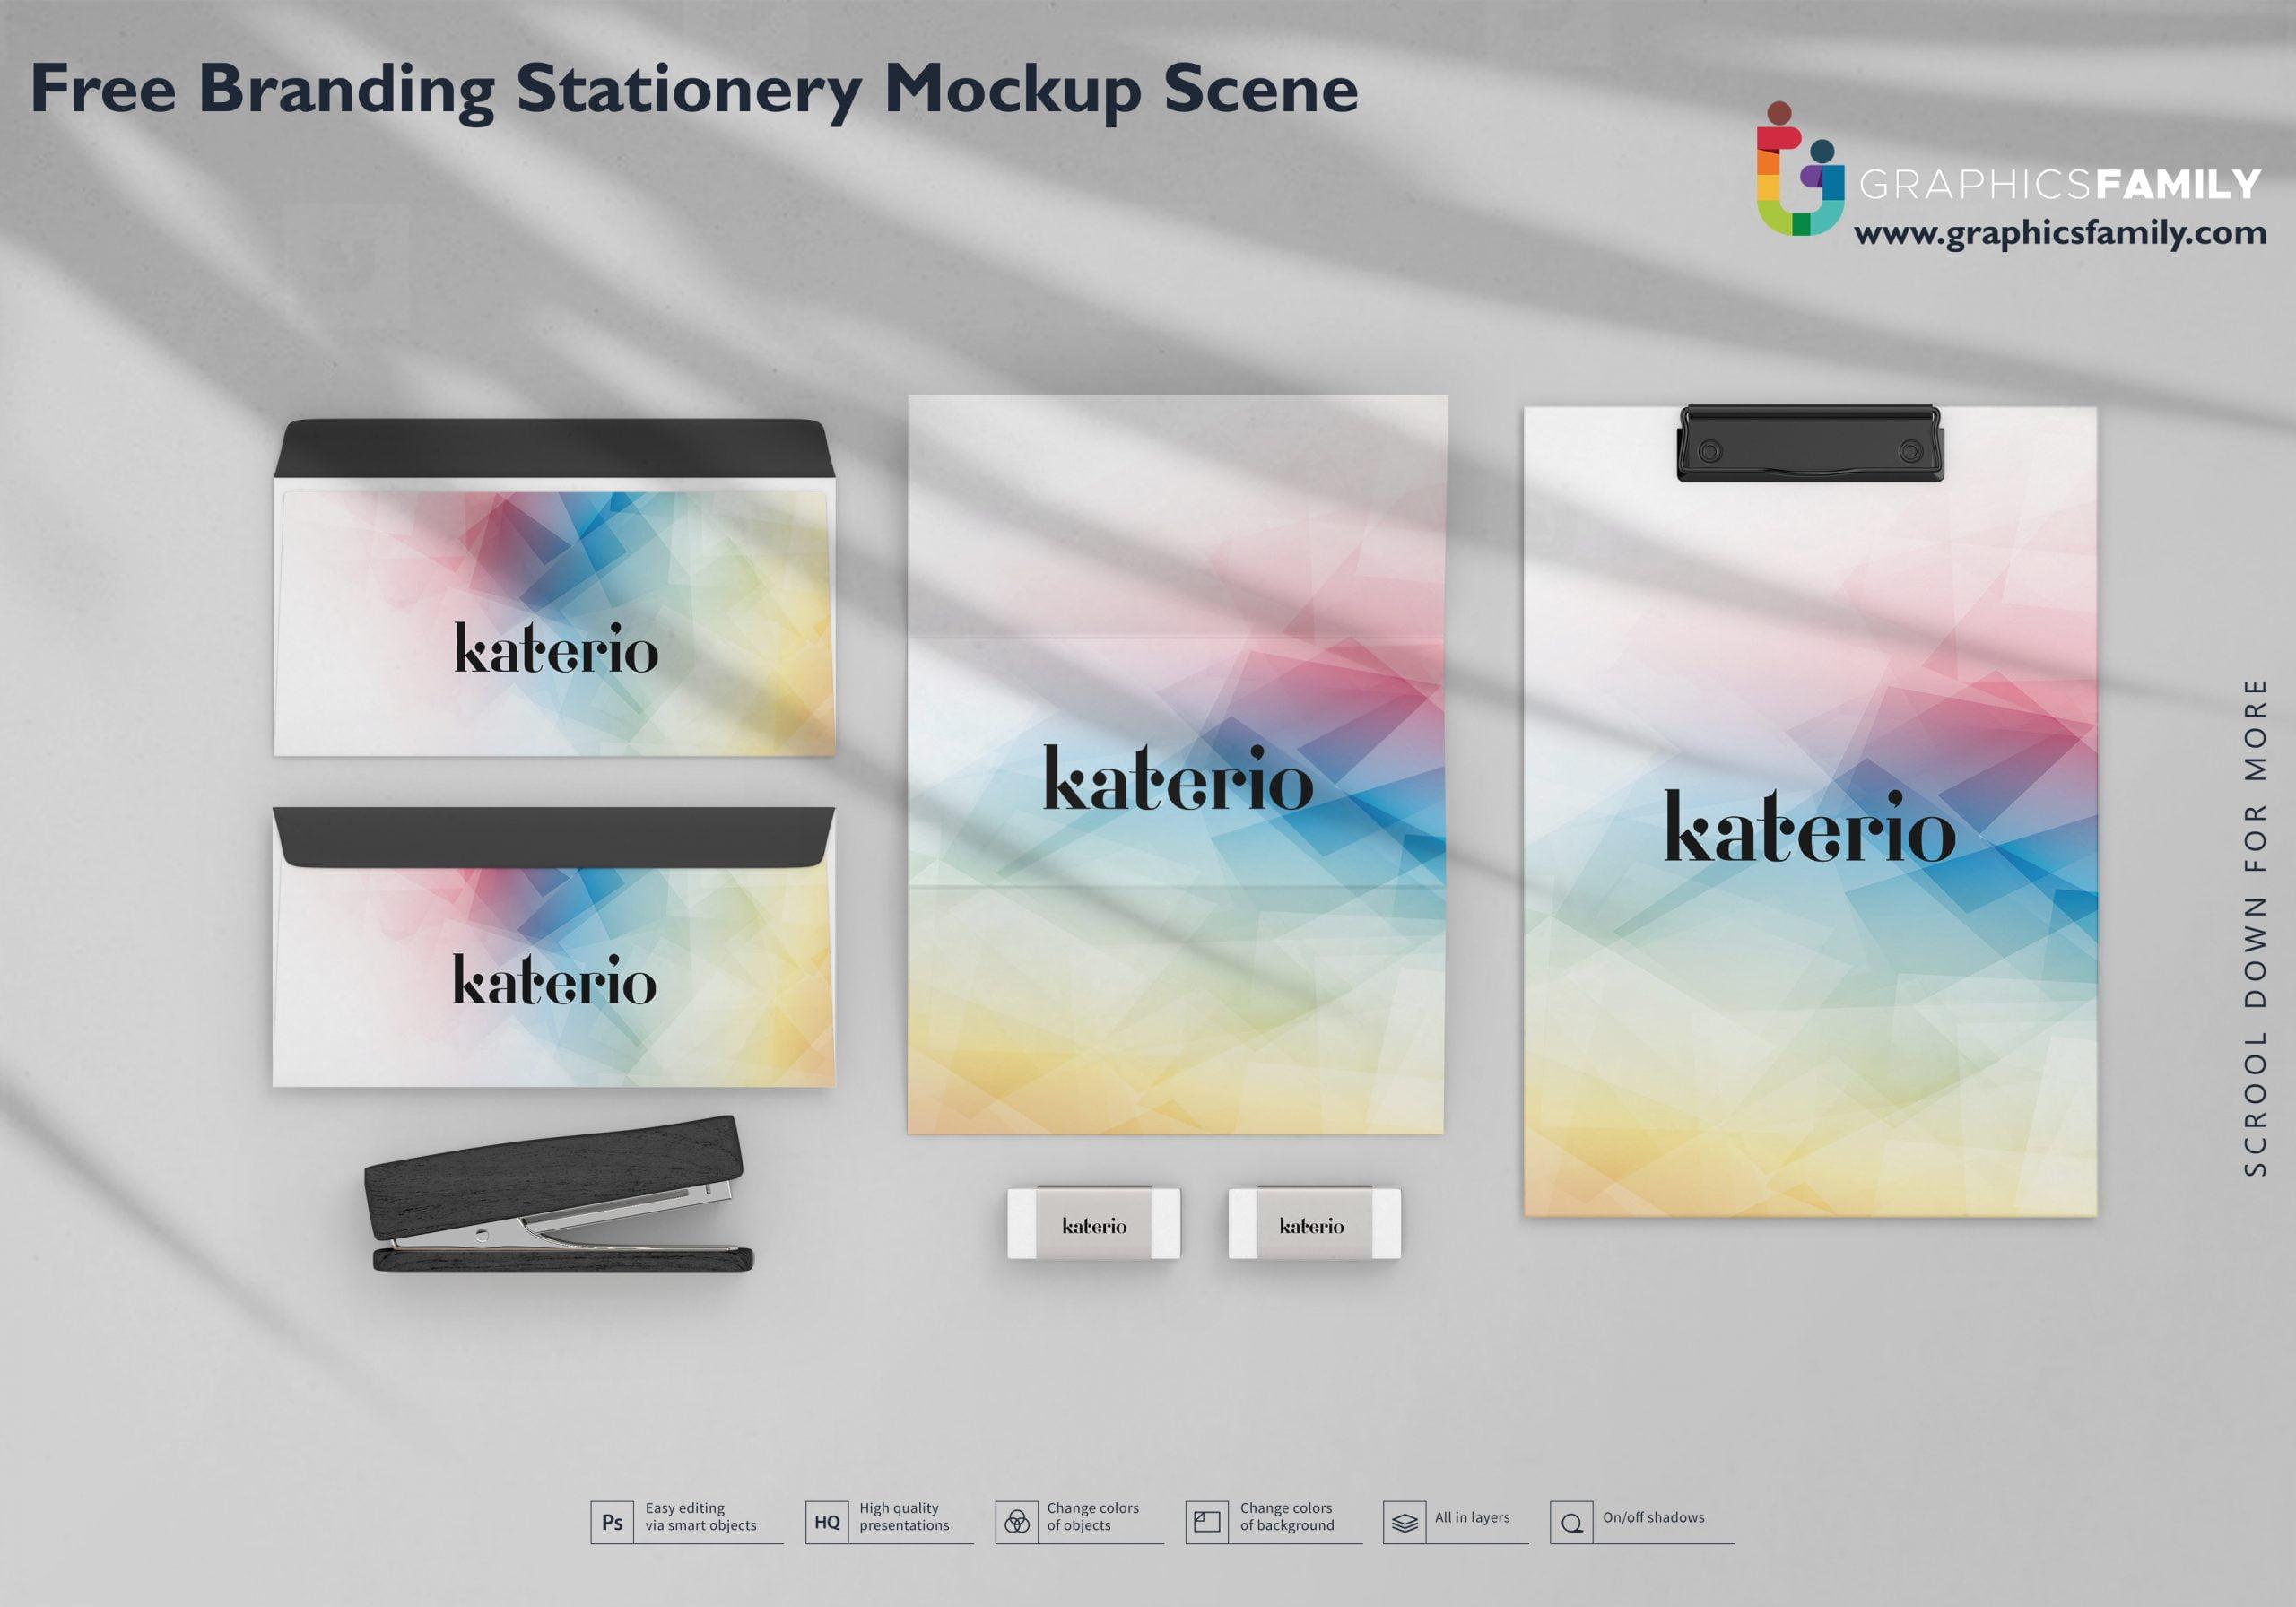 Free Branding Stationery Mockup Scene Download